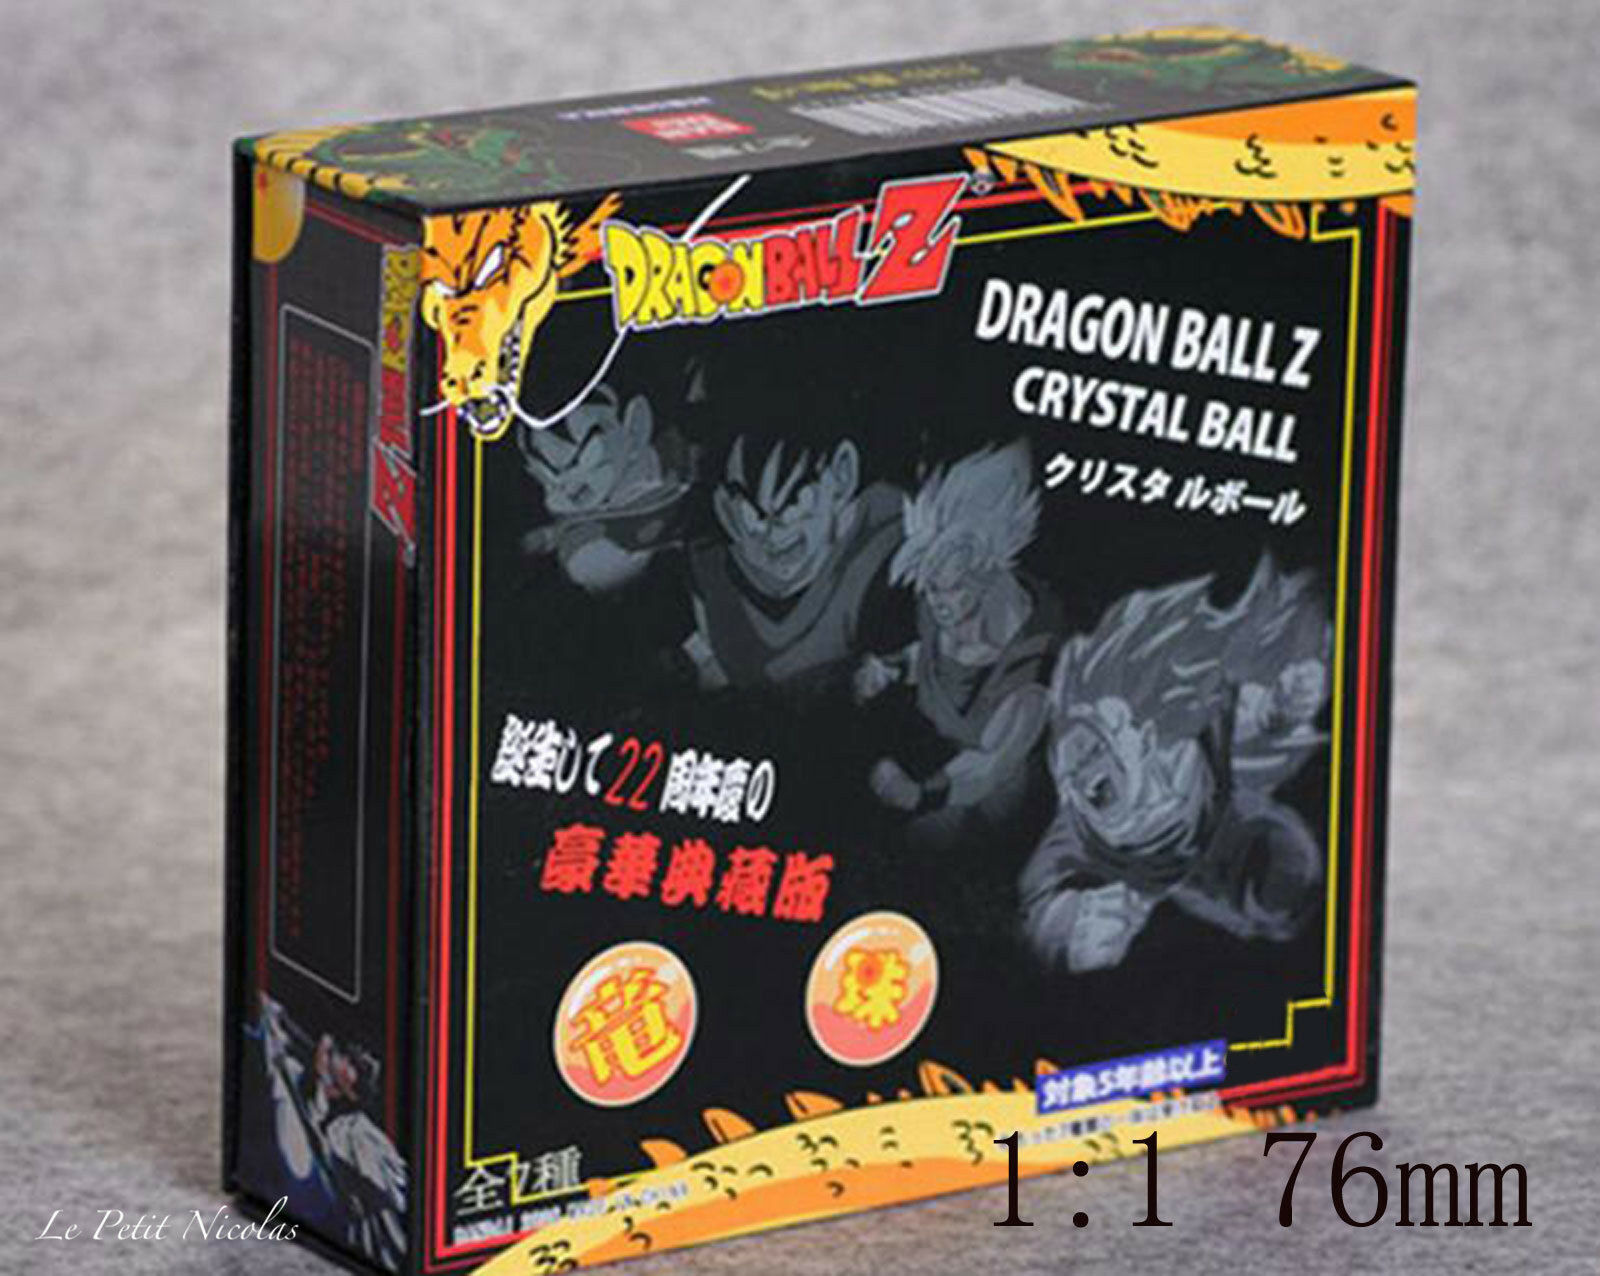 Dragon Ball Z DBZ lot de sept Dragon Balls très grandes 1 1 diamètre 76mm balls